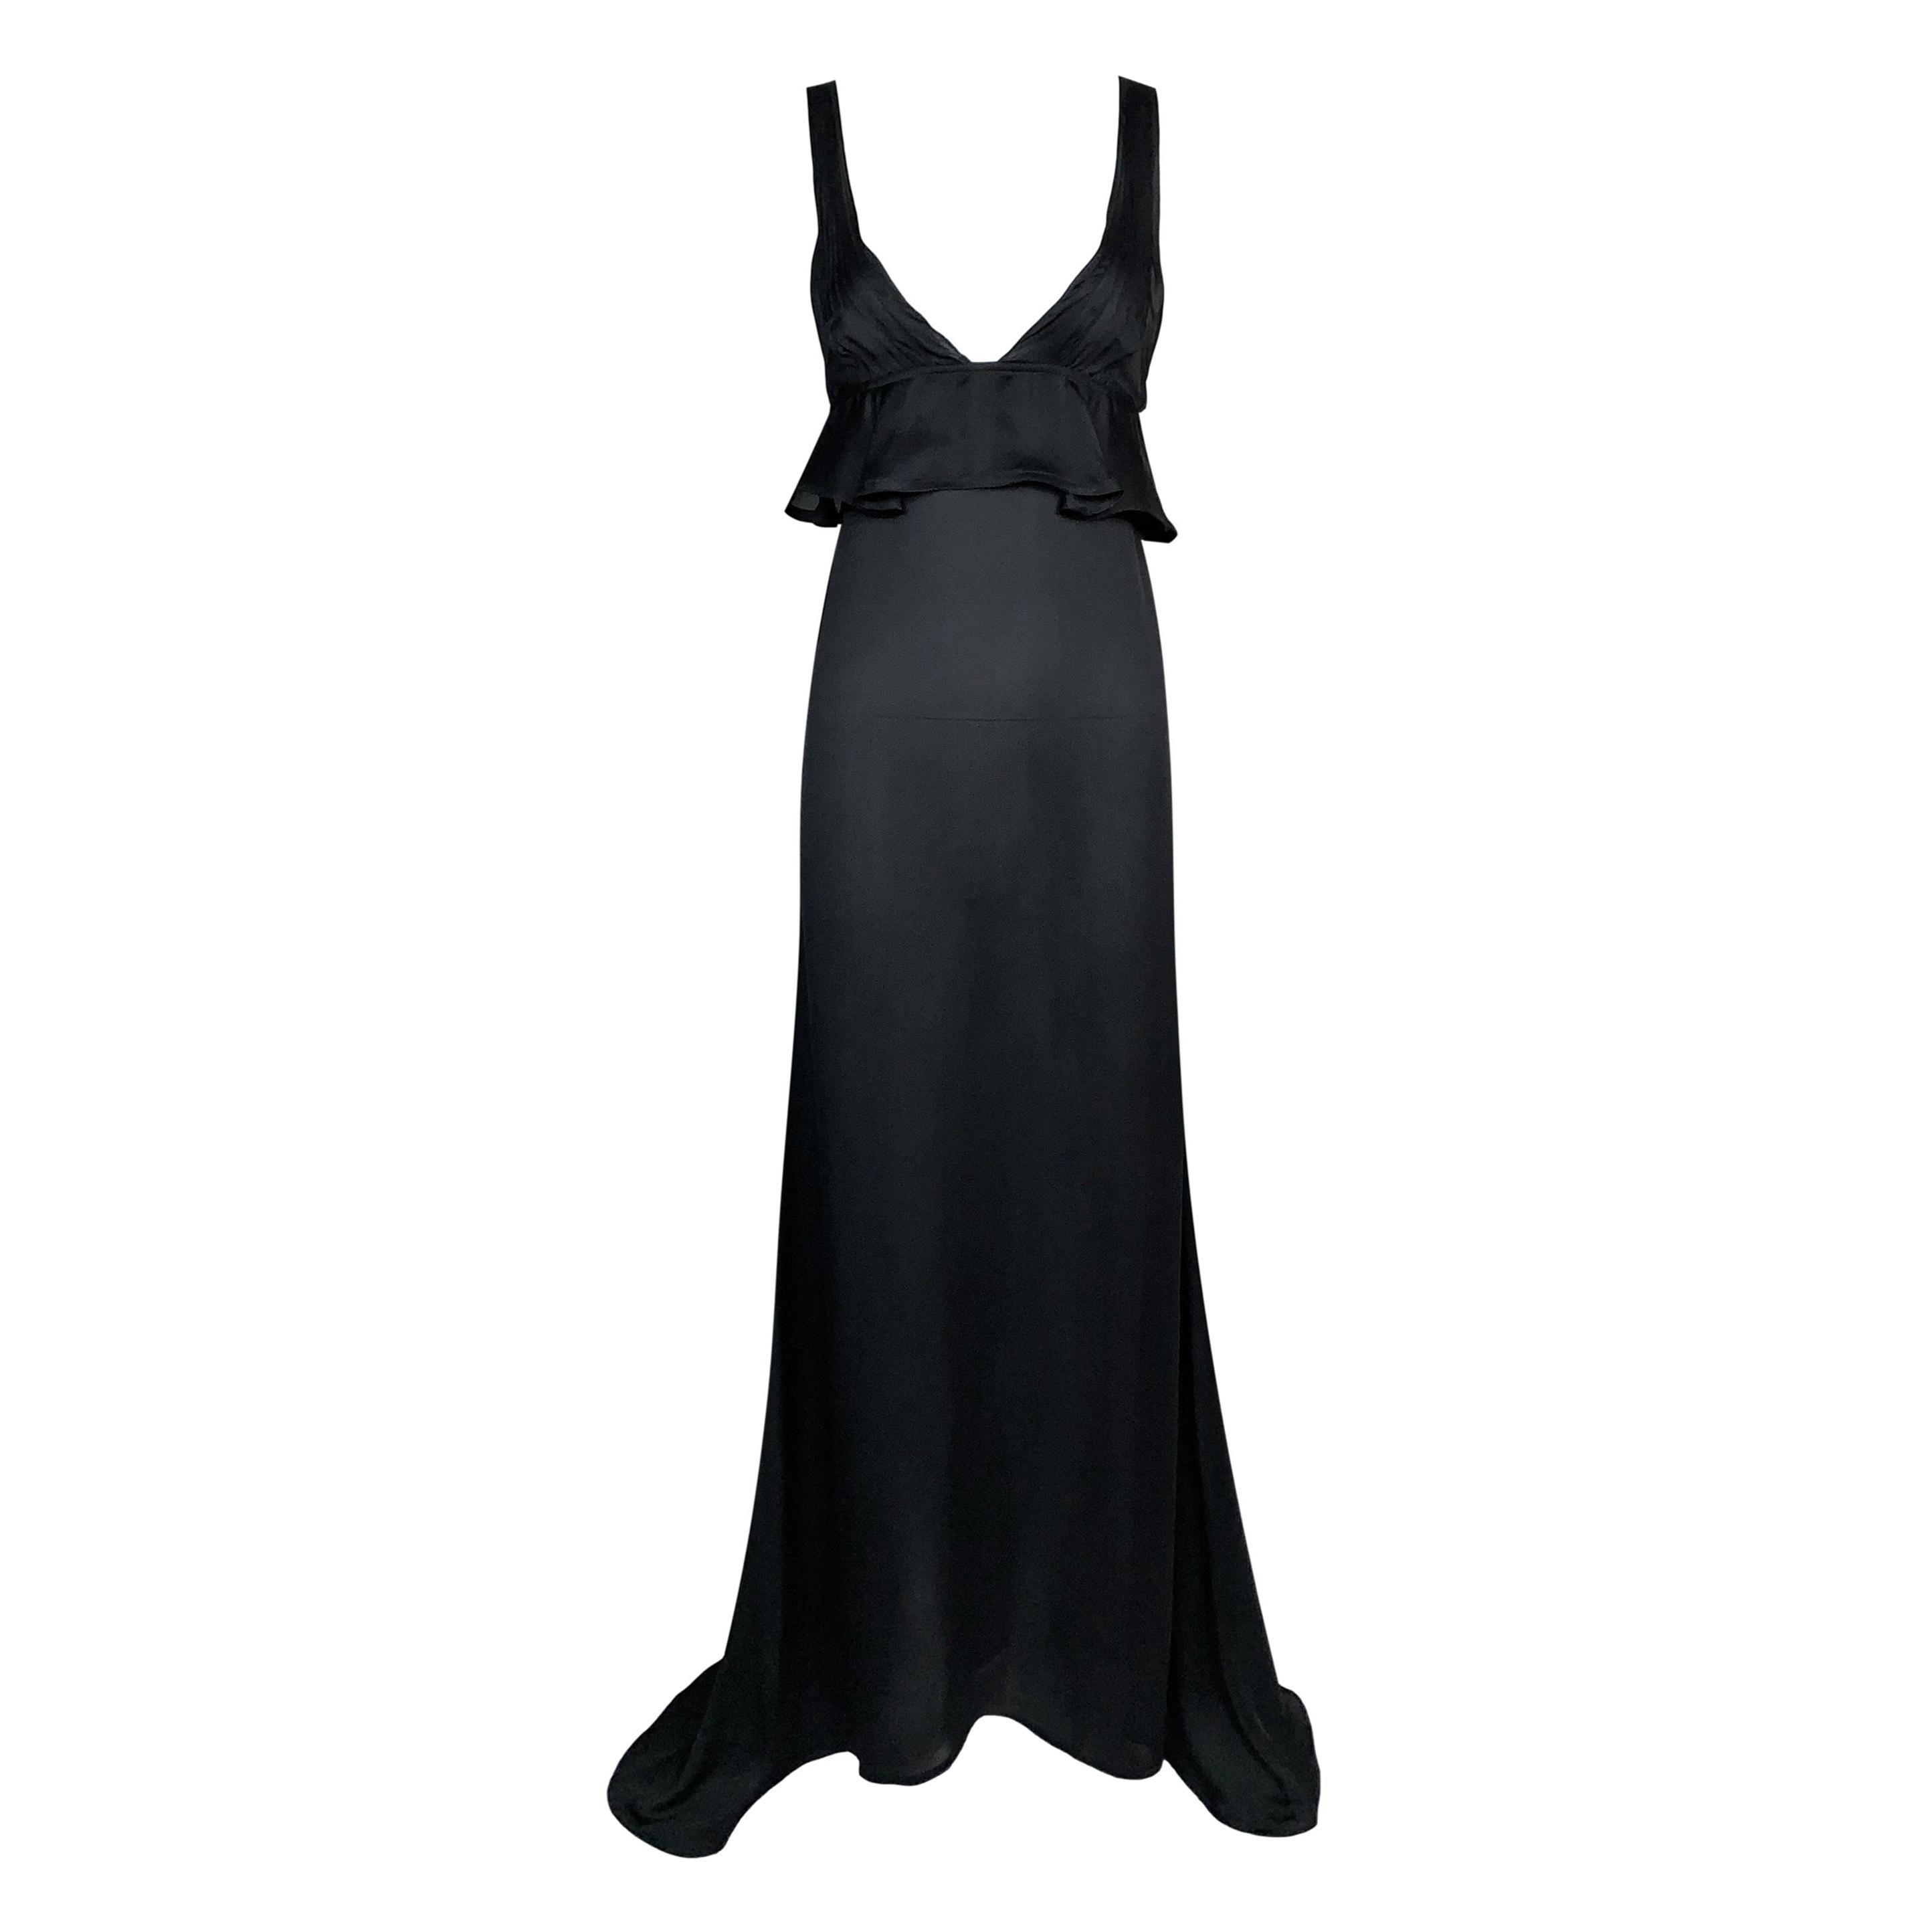 F/W 2003 Yves Saint Laurent Tom Ford Runway Sheer Black Silk Plunging Gown Dress